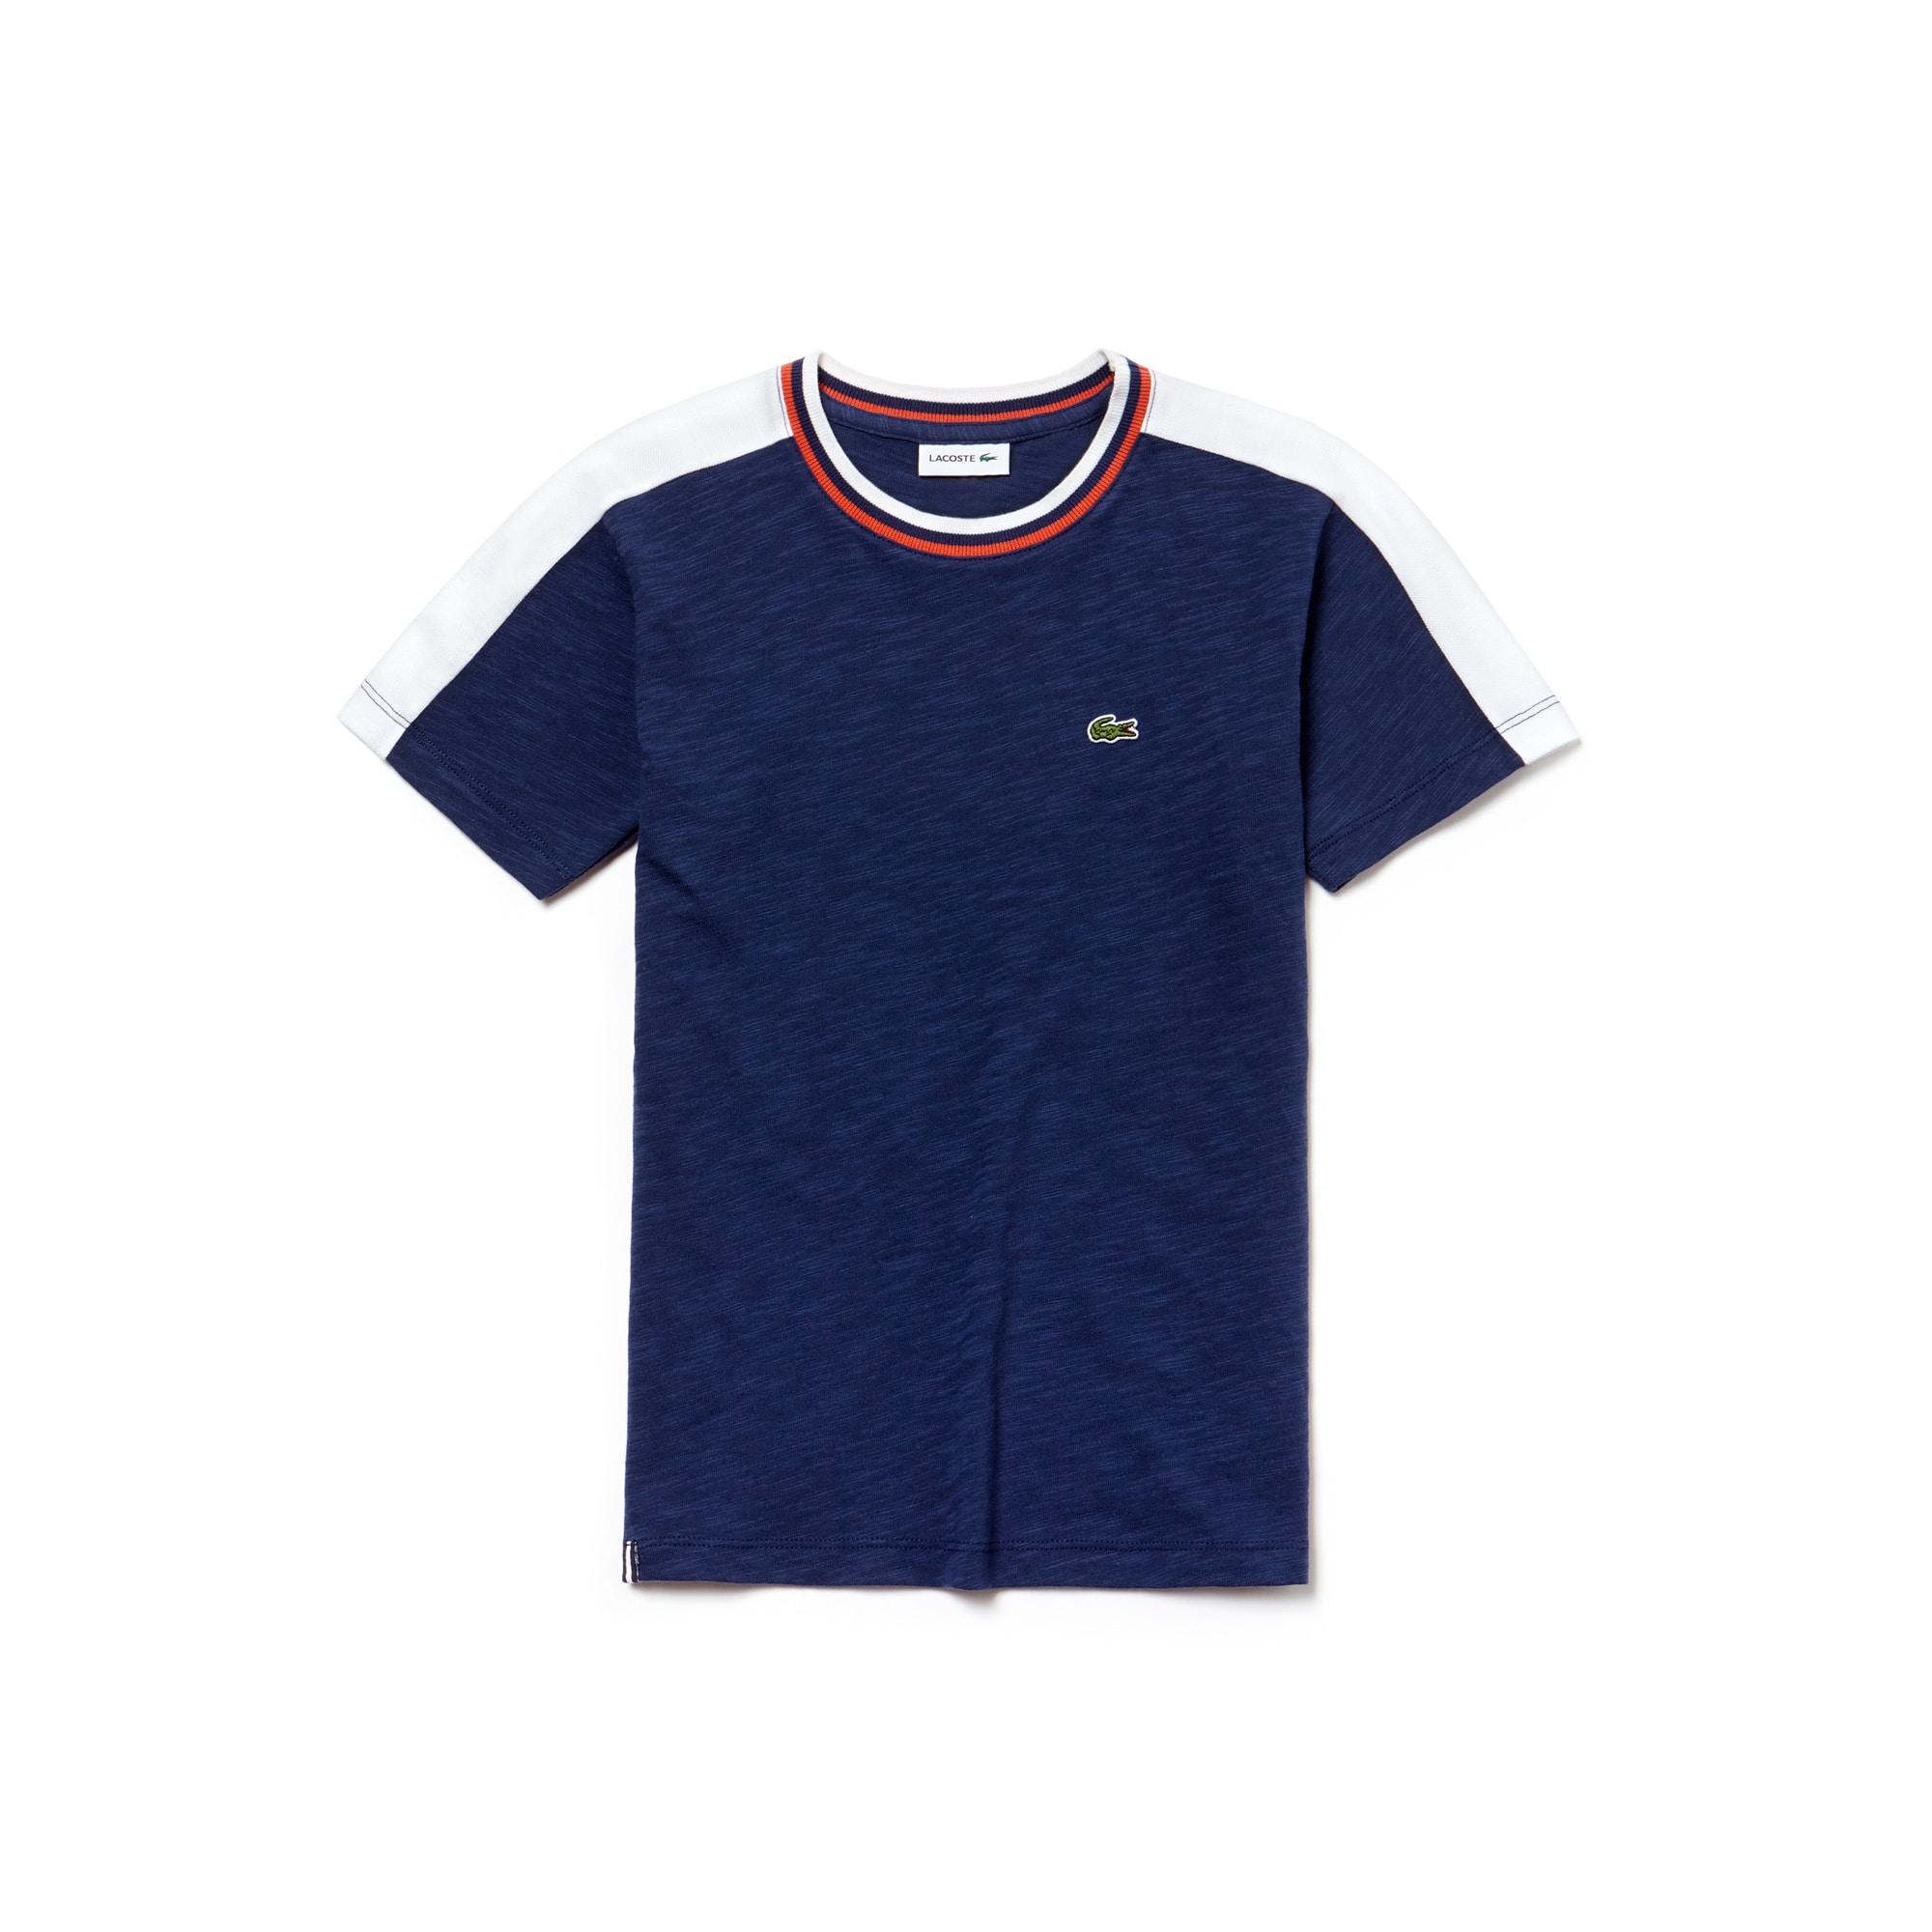 Boys' Colorblock Flamme Jersey T-shirt